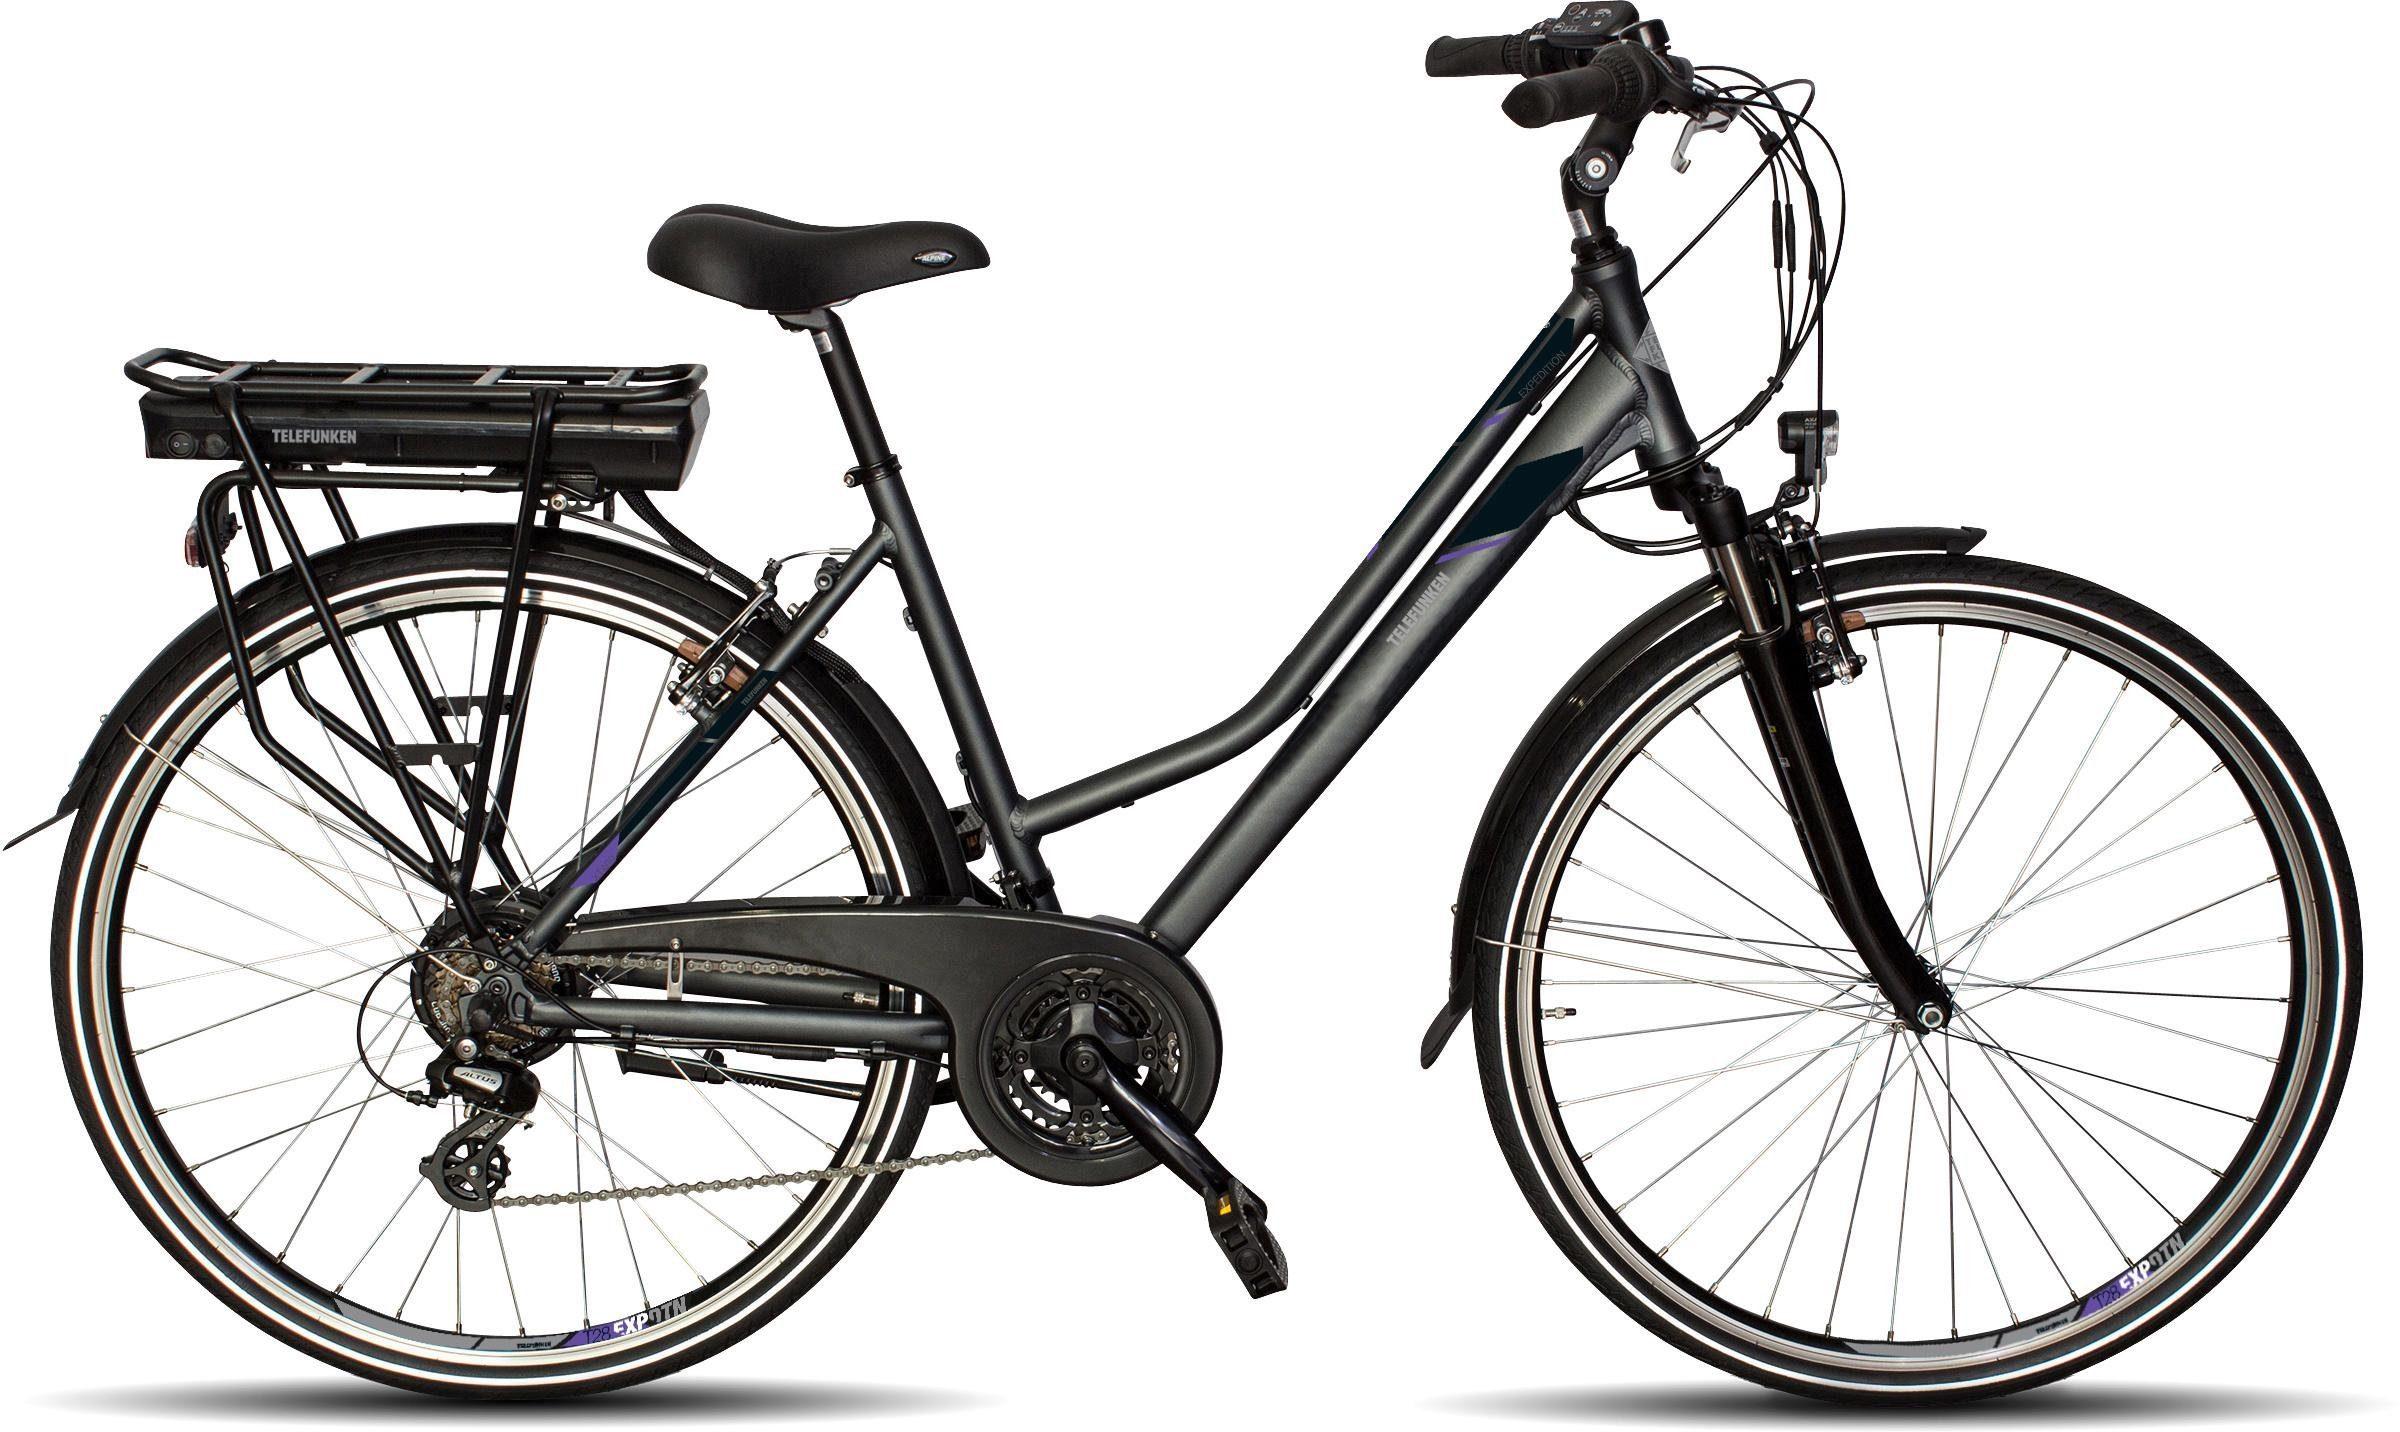 Telefunken E-Bike »XT469 Expedition«, 21 Gang Shimano Altus Schaltwerk, Kettenschaltung, Heckmotor 250 W